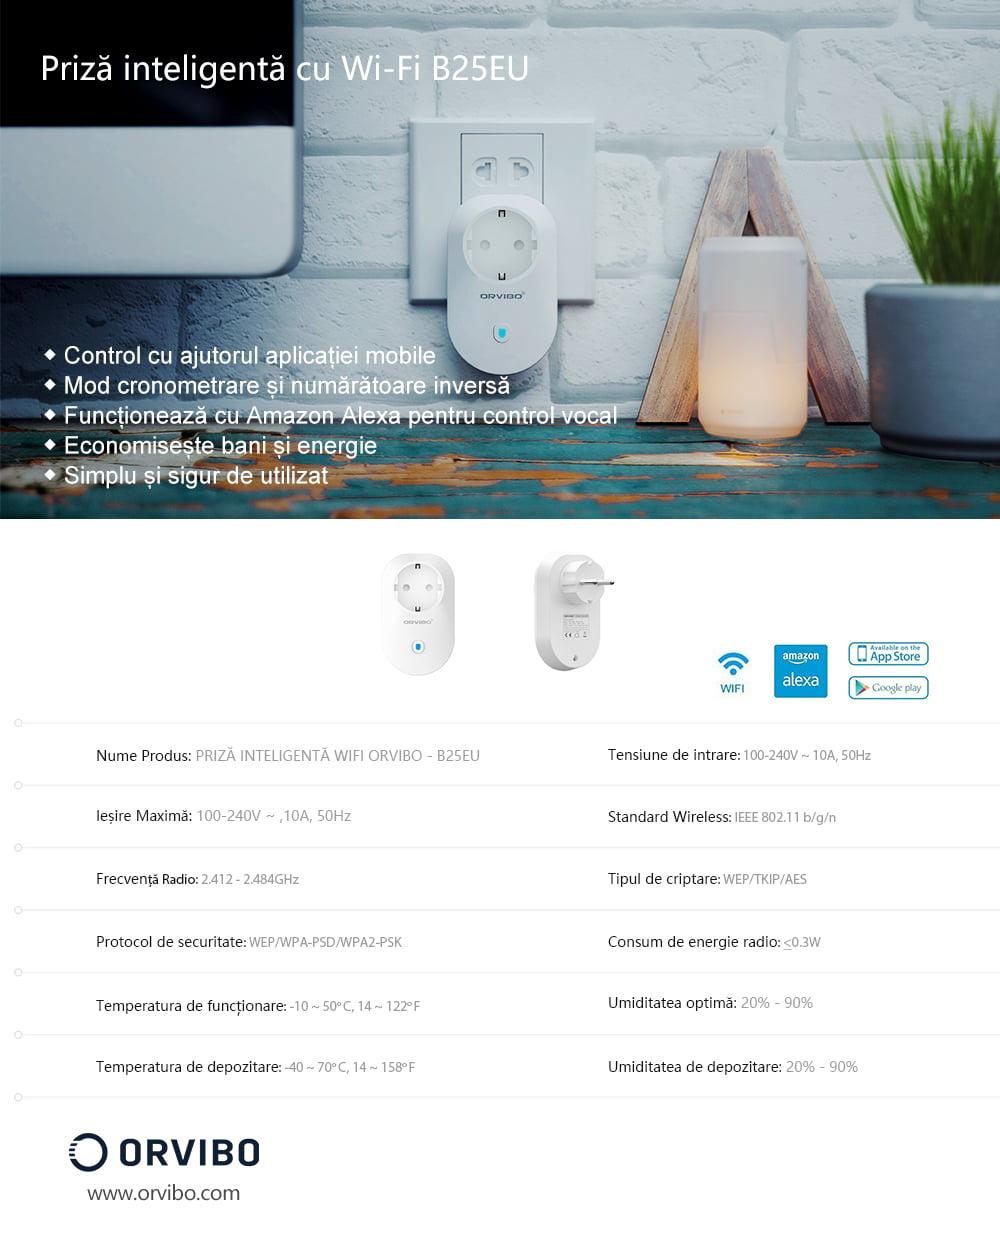 Priza Inteligenta Orvibo Wi-Fi B25EU, Control de pe telefonul mobil 20